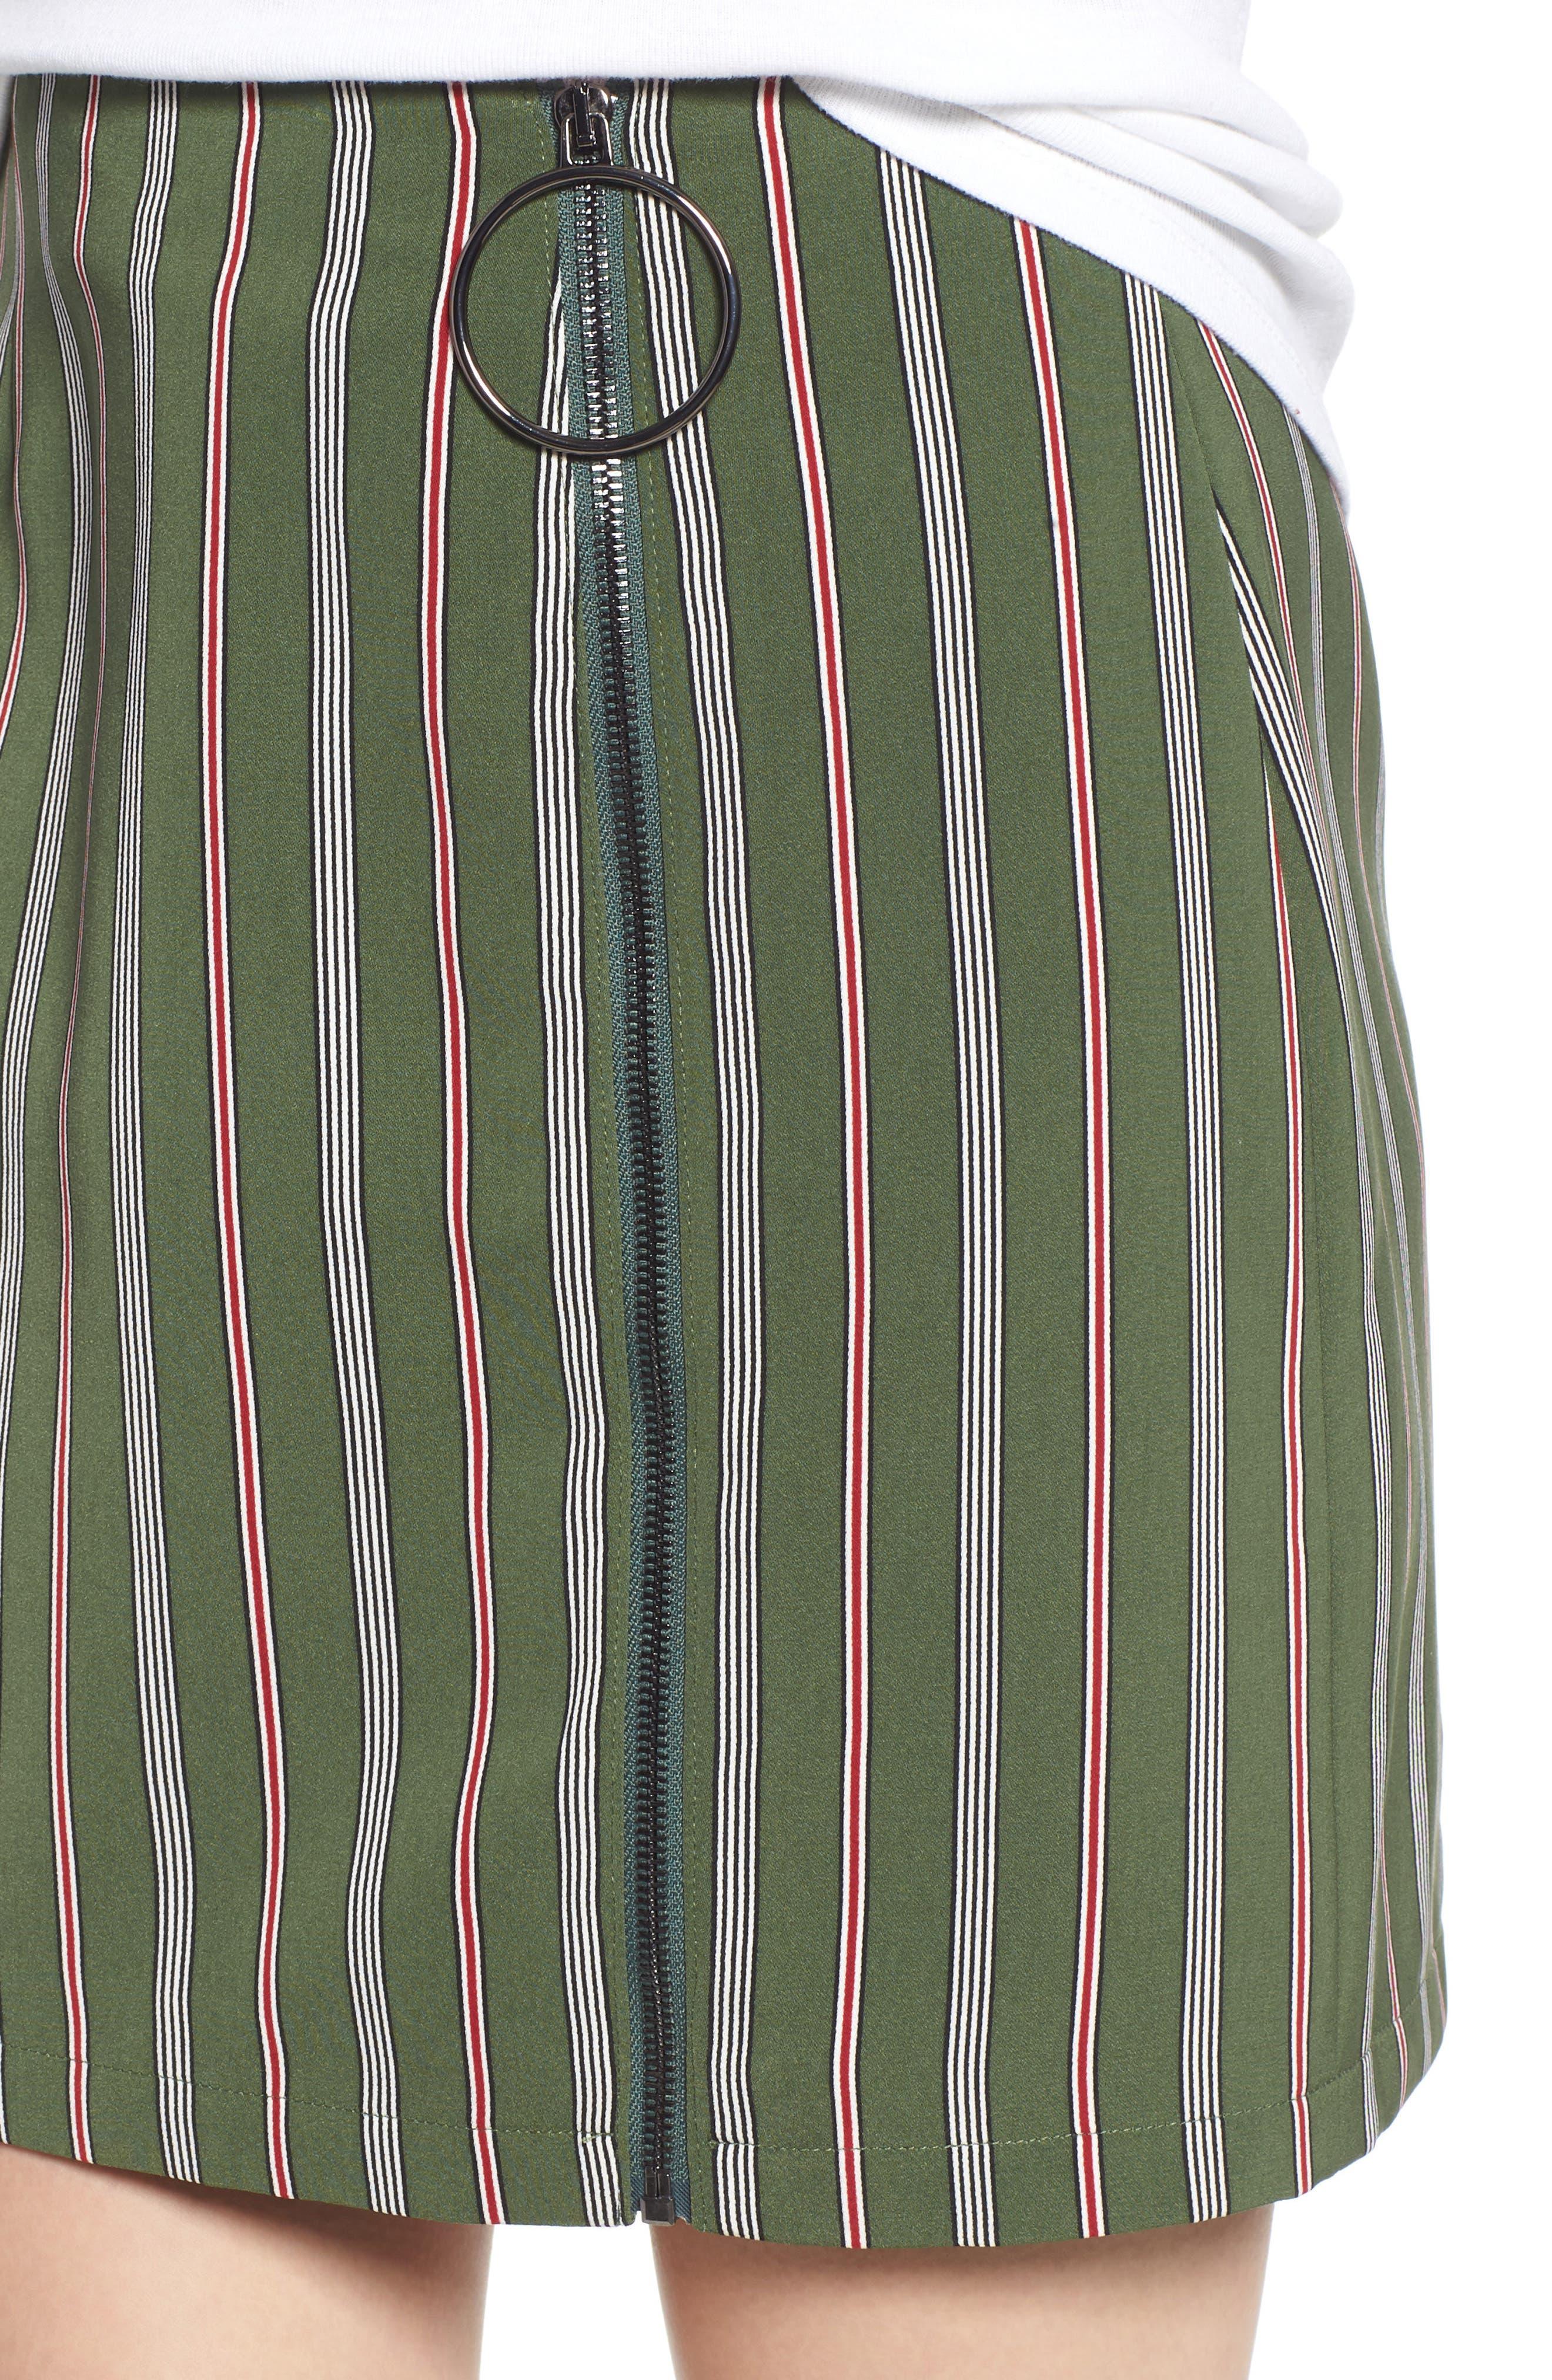 Axial Stripe Miniskirt,                             Alternate thumbnail 4, color,                             300